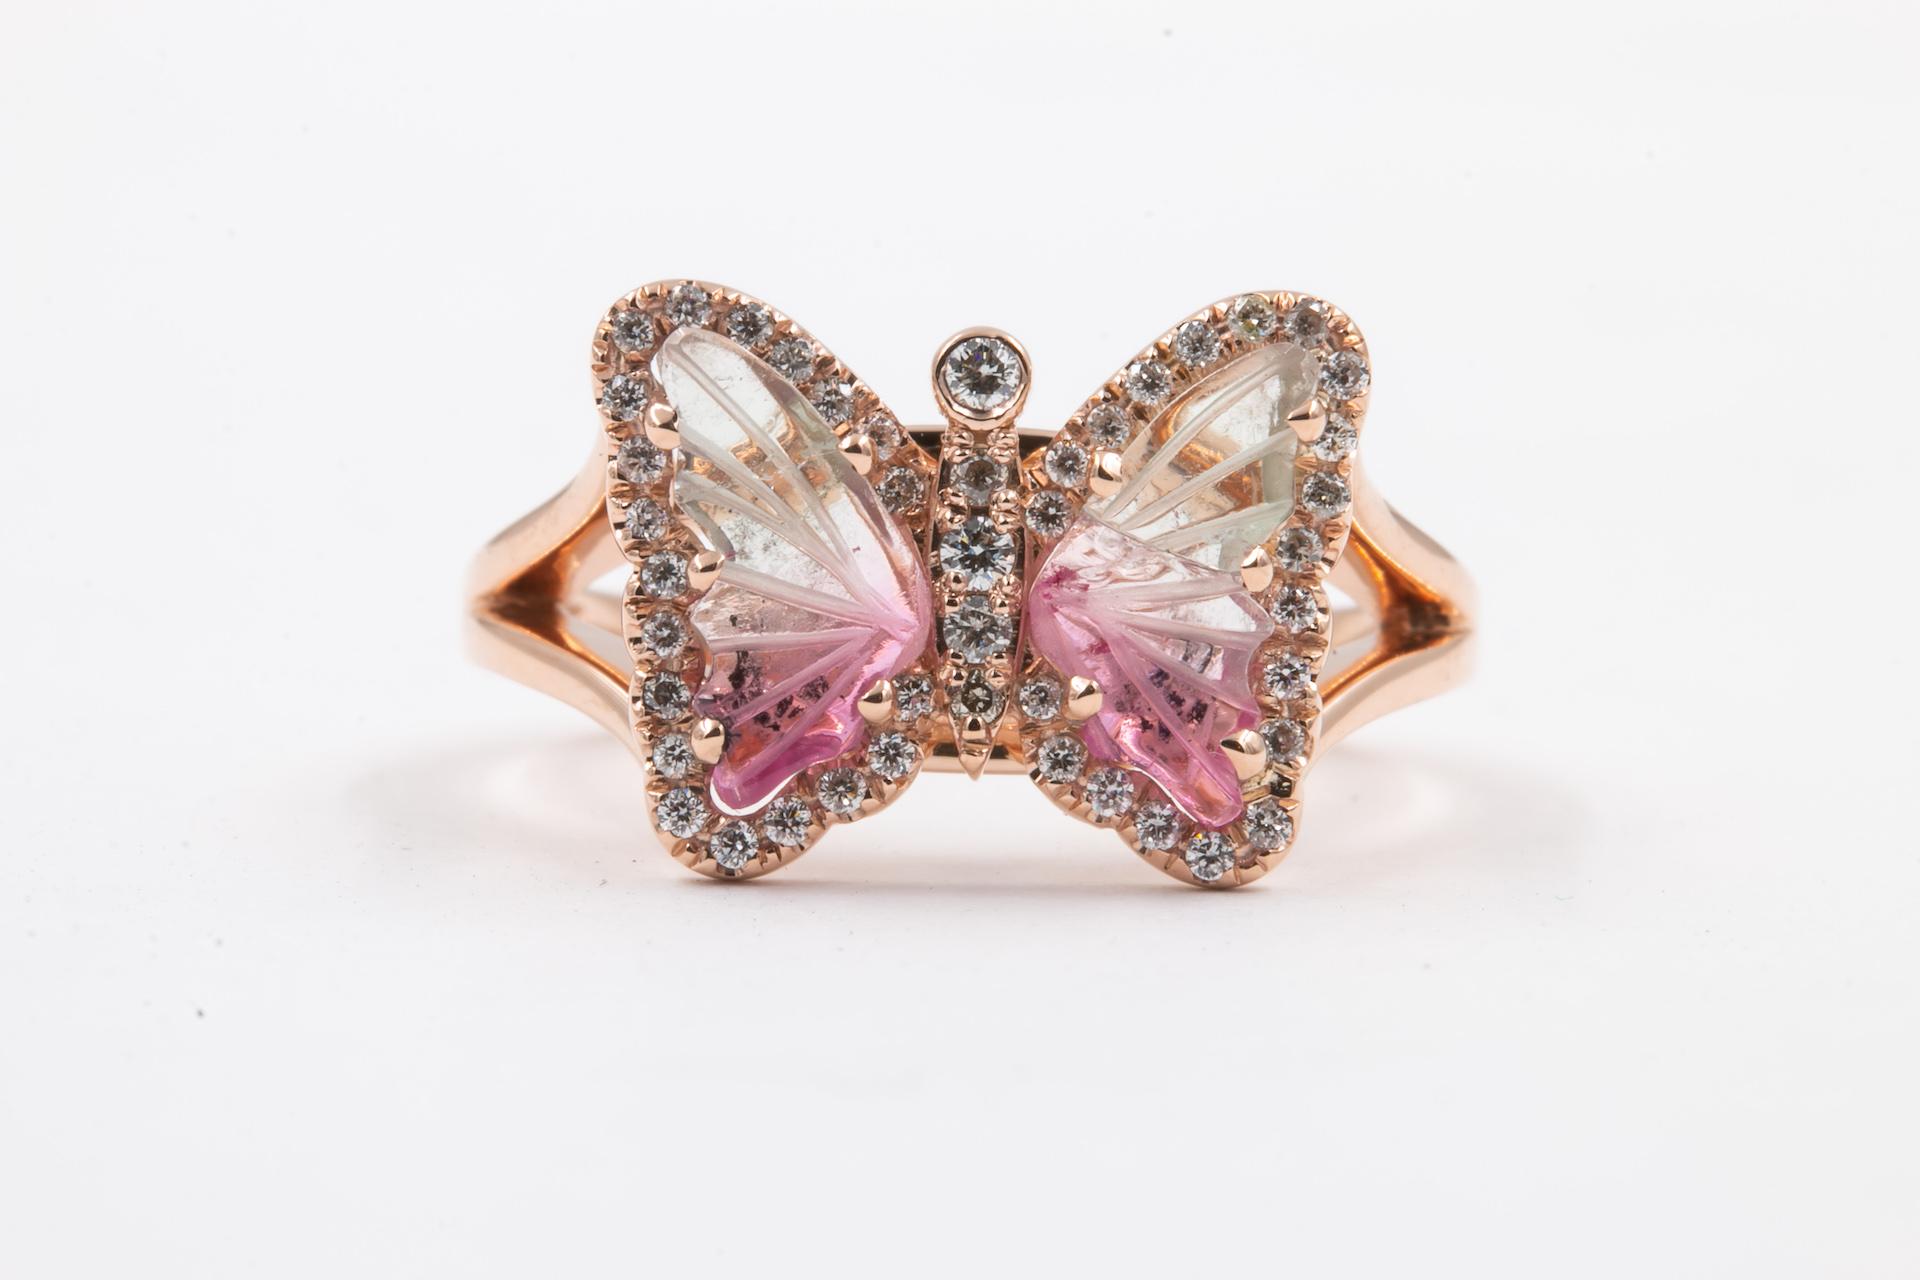 watermelon-tourmaline-ring-butterfly-jewelry-diamonds-